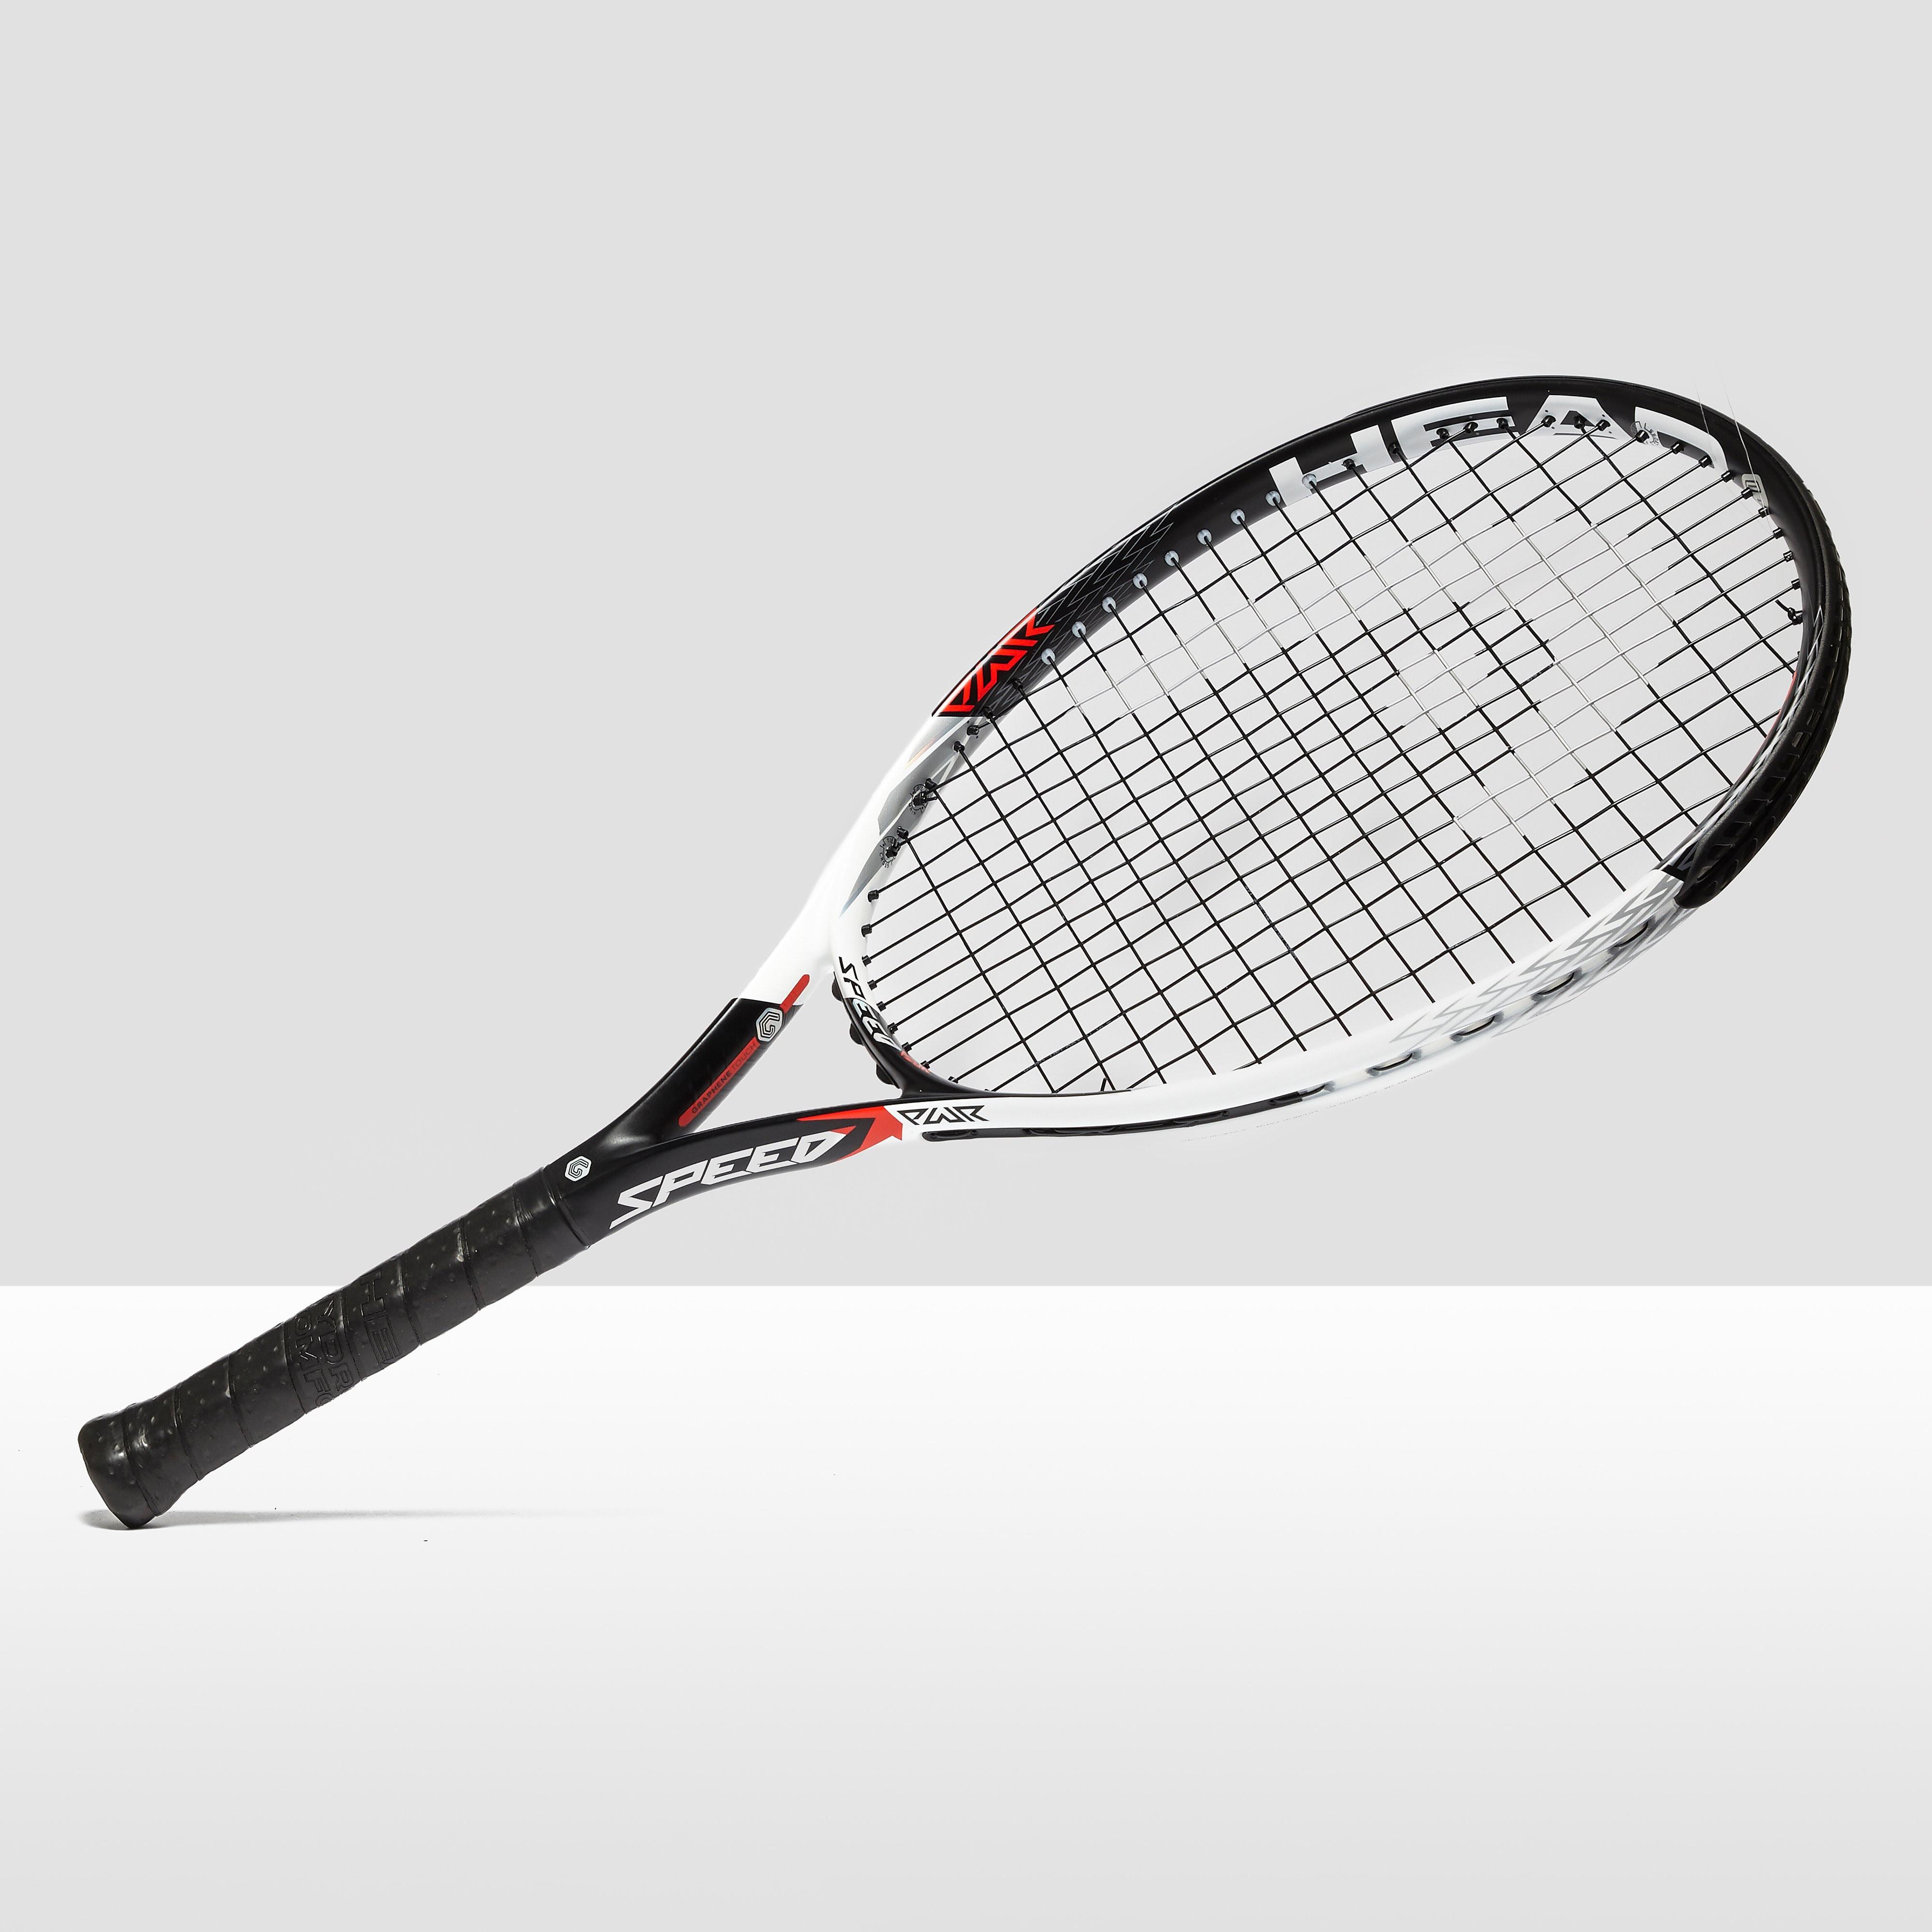 Head Graphene Touch PWR Speed Tennis Racket